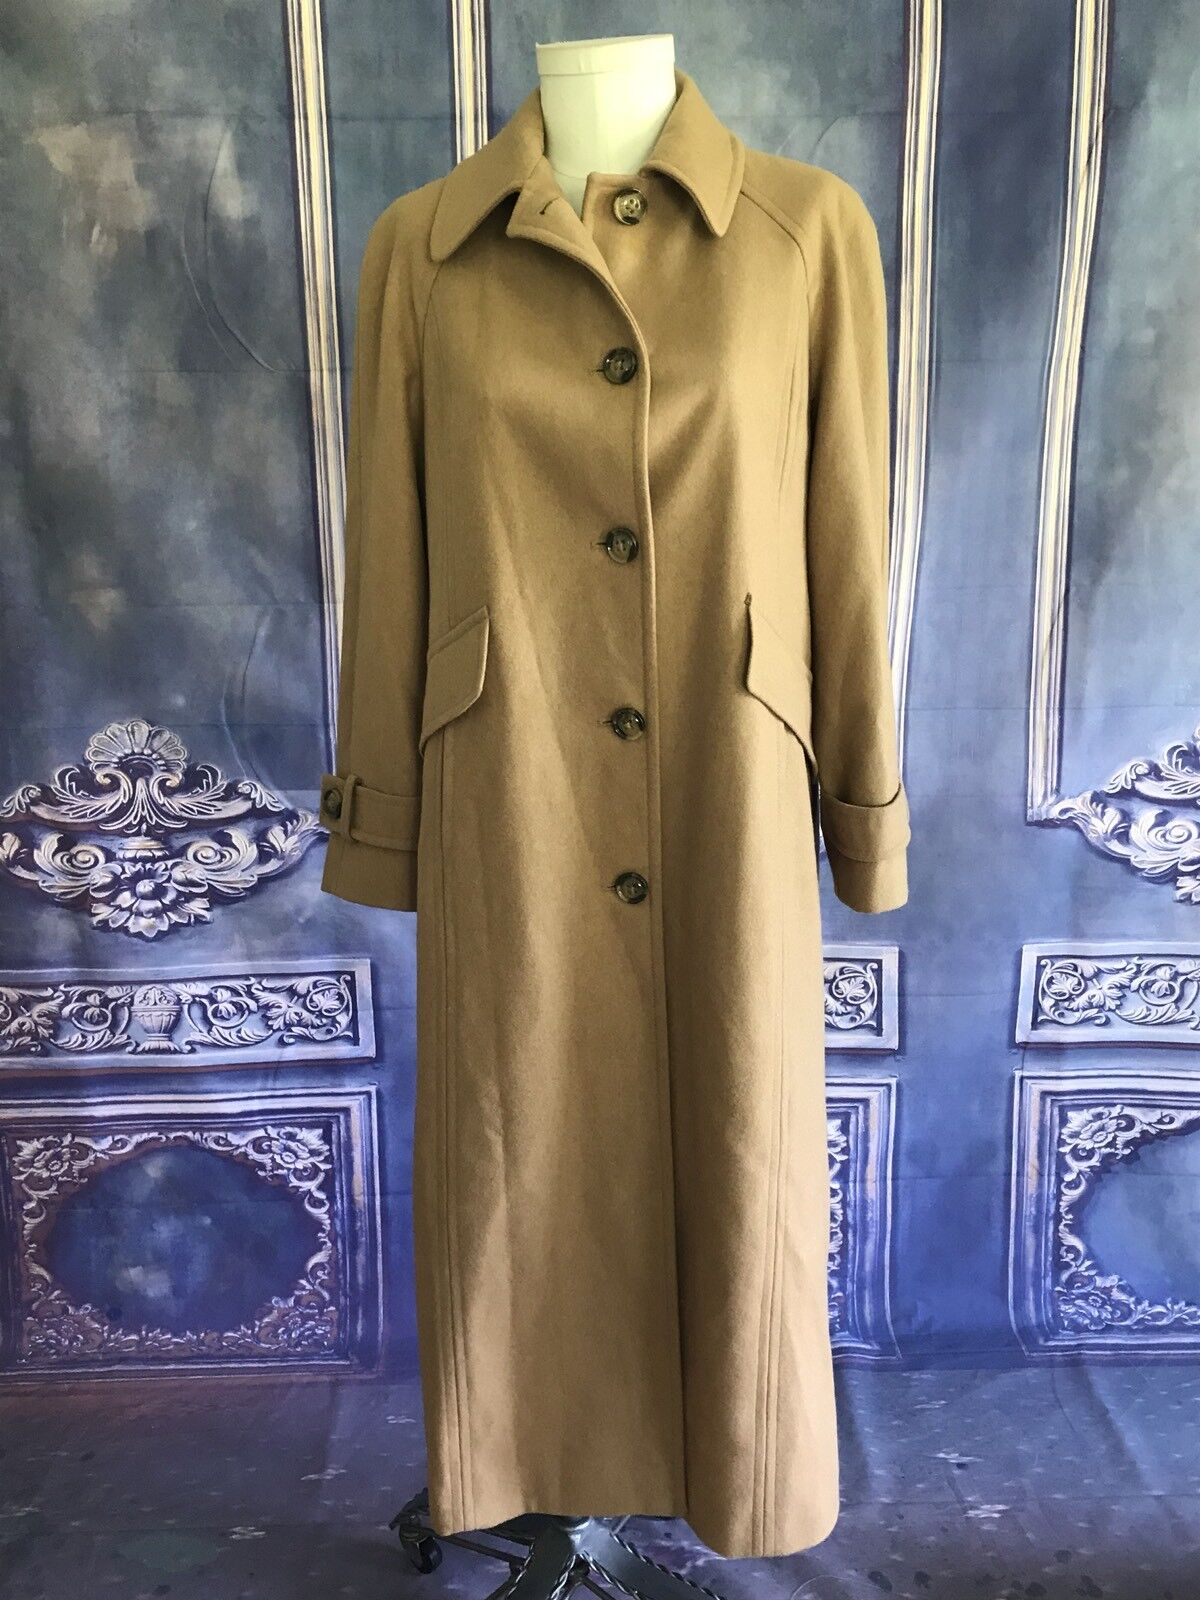 London Fog Camel Beige Long Length Walking Coat SZ 12 Wool Tortoiseshell Buttons